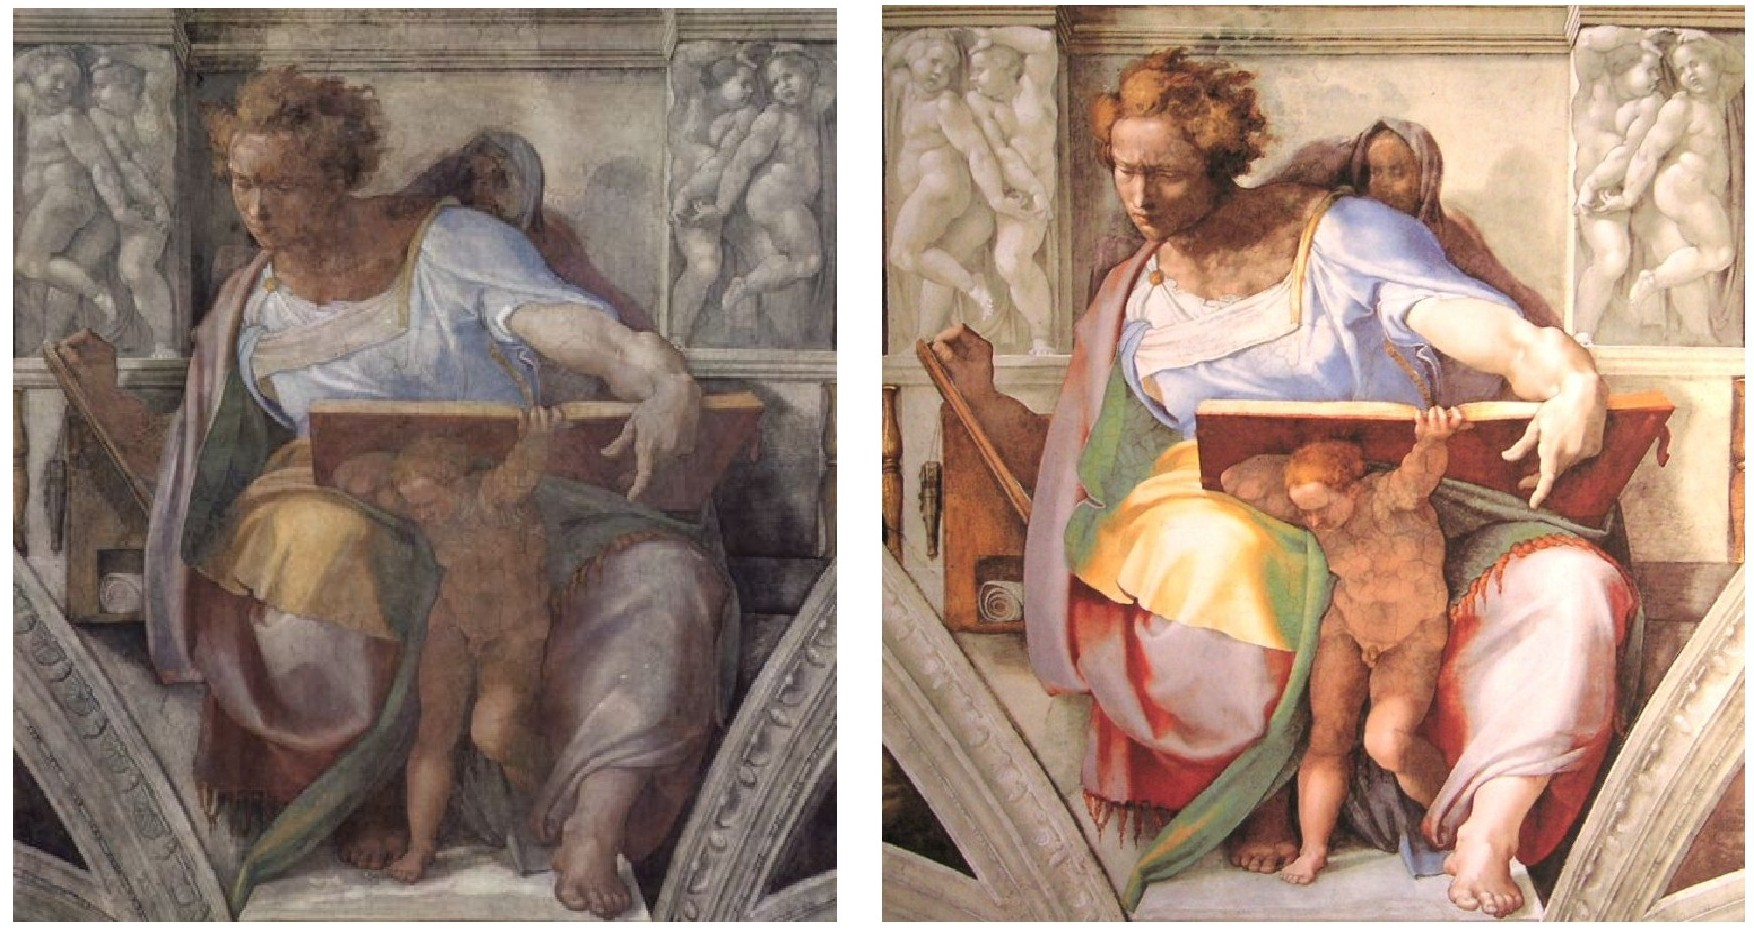 File:Sistine Chapel Daniel beforandafter.jpg - Wikipedia Da Vinci Last Supper High Resolution